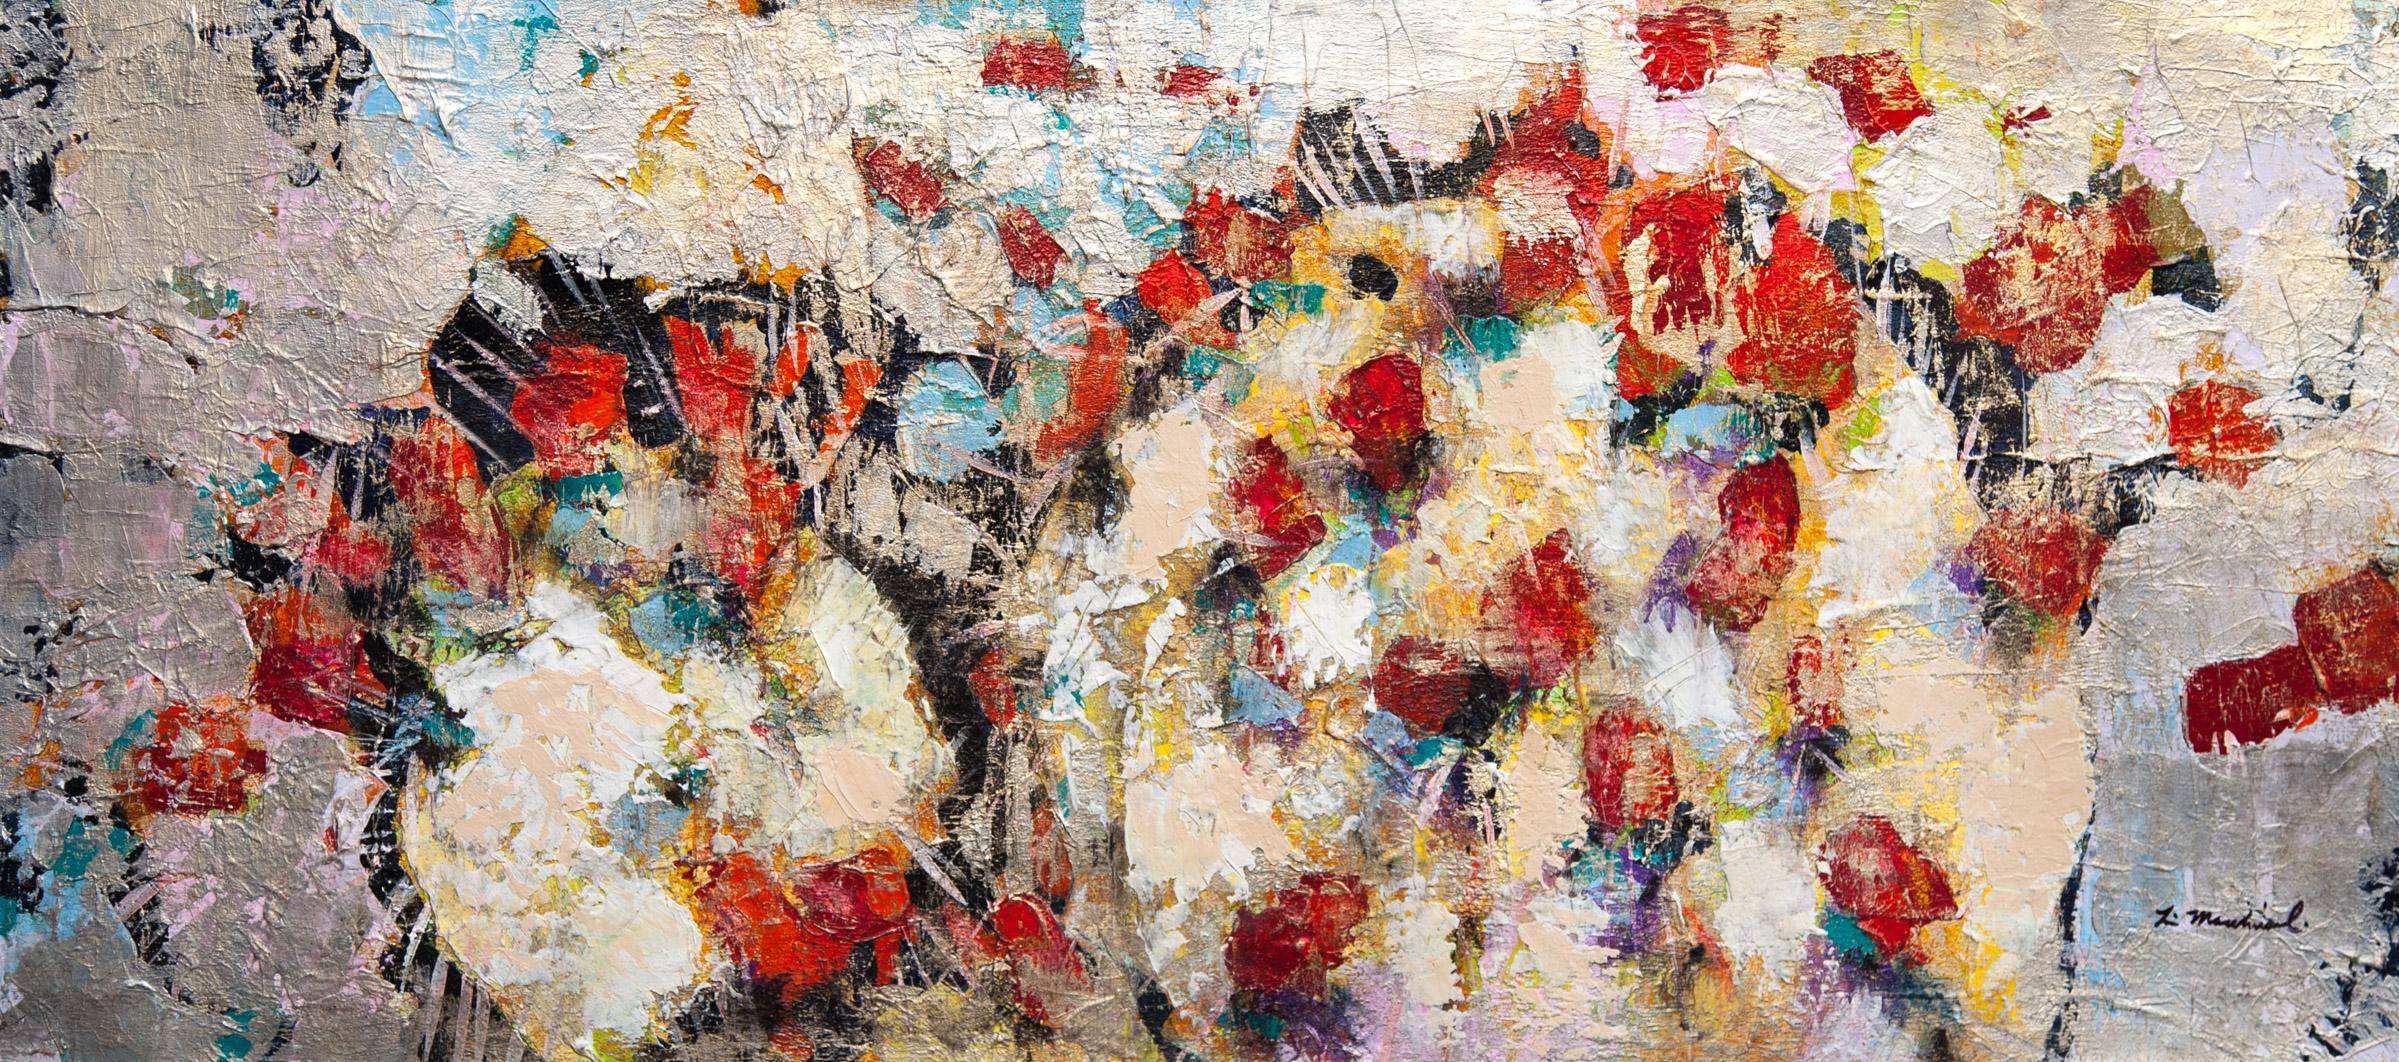 Lisa Macchiaroli - Desert Rose 20x40